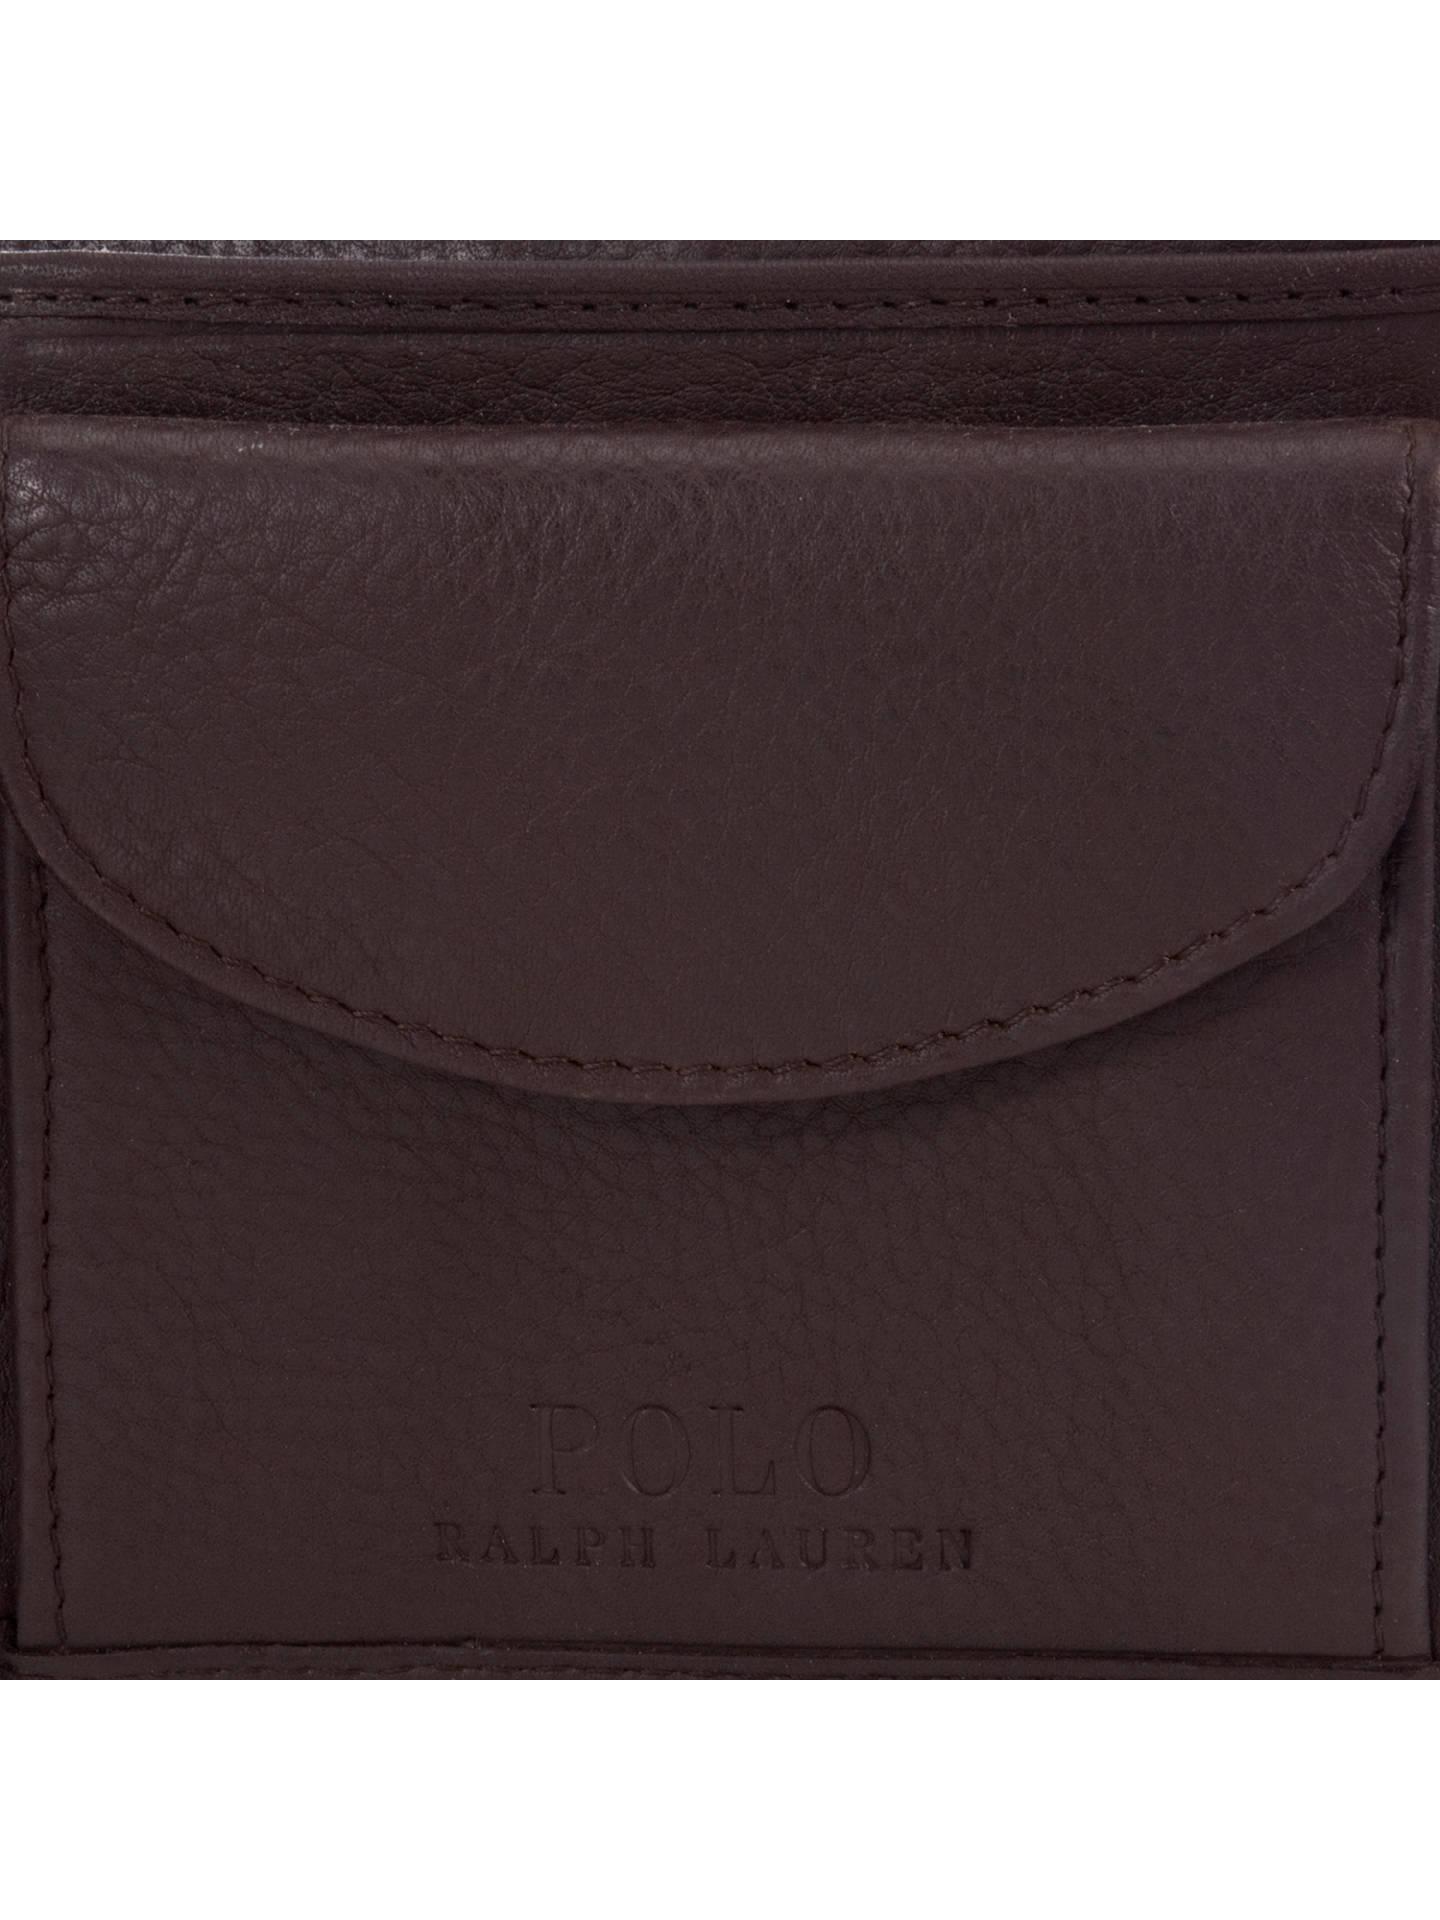 72539a6d Polo Ralph Lauren Pebble Leather Wallet, Brown